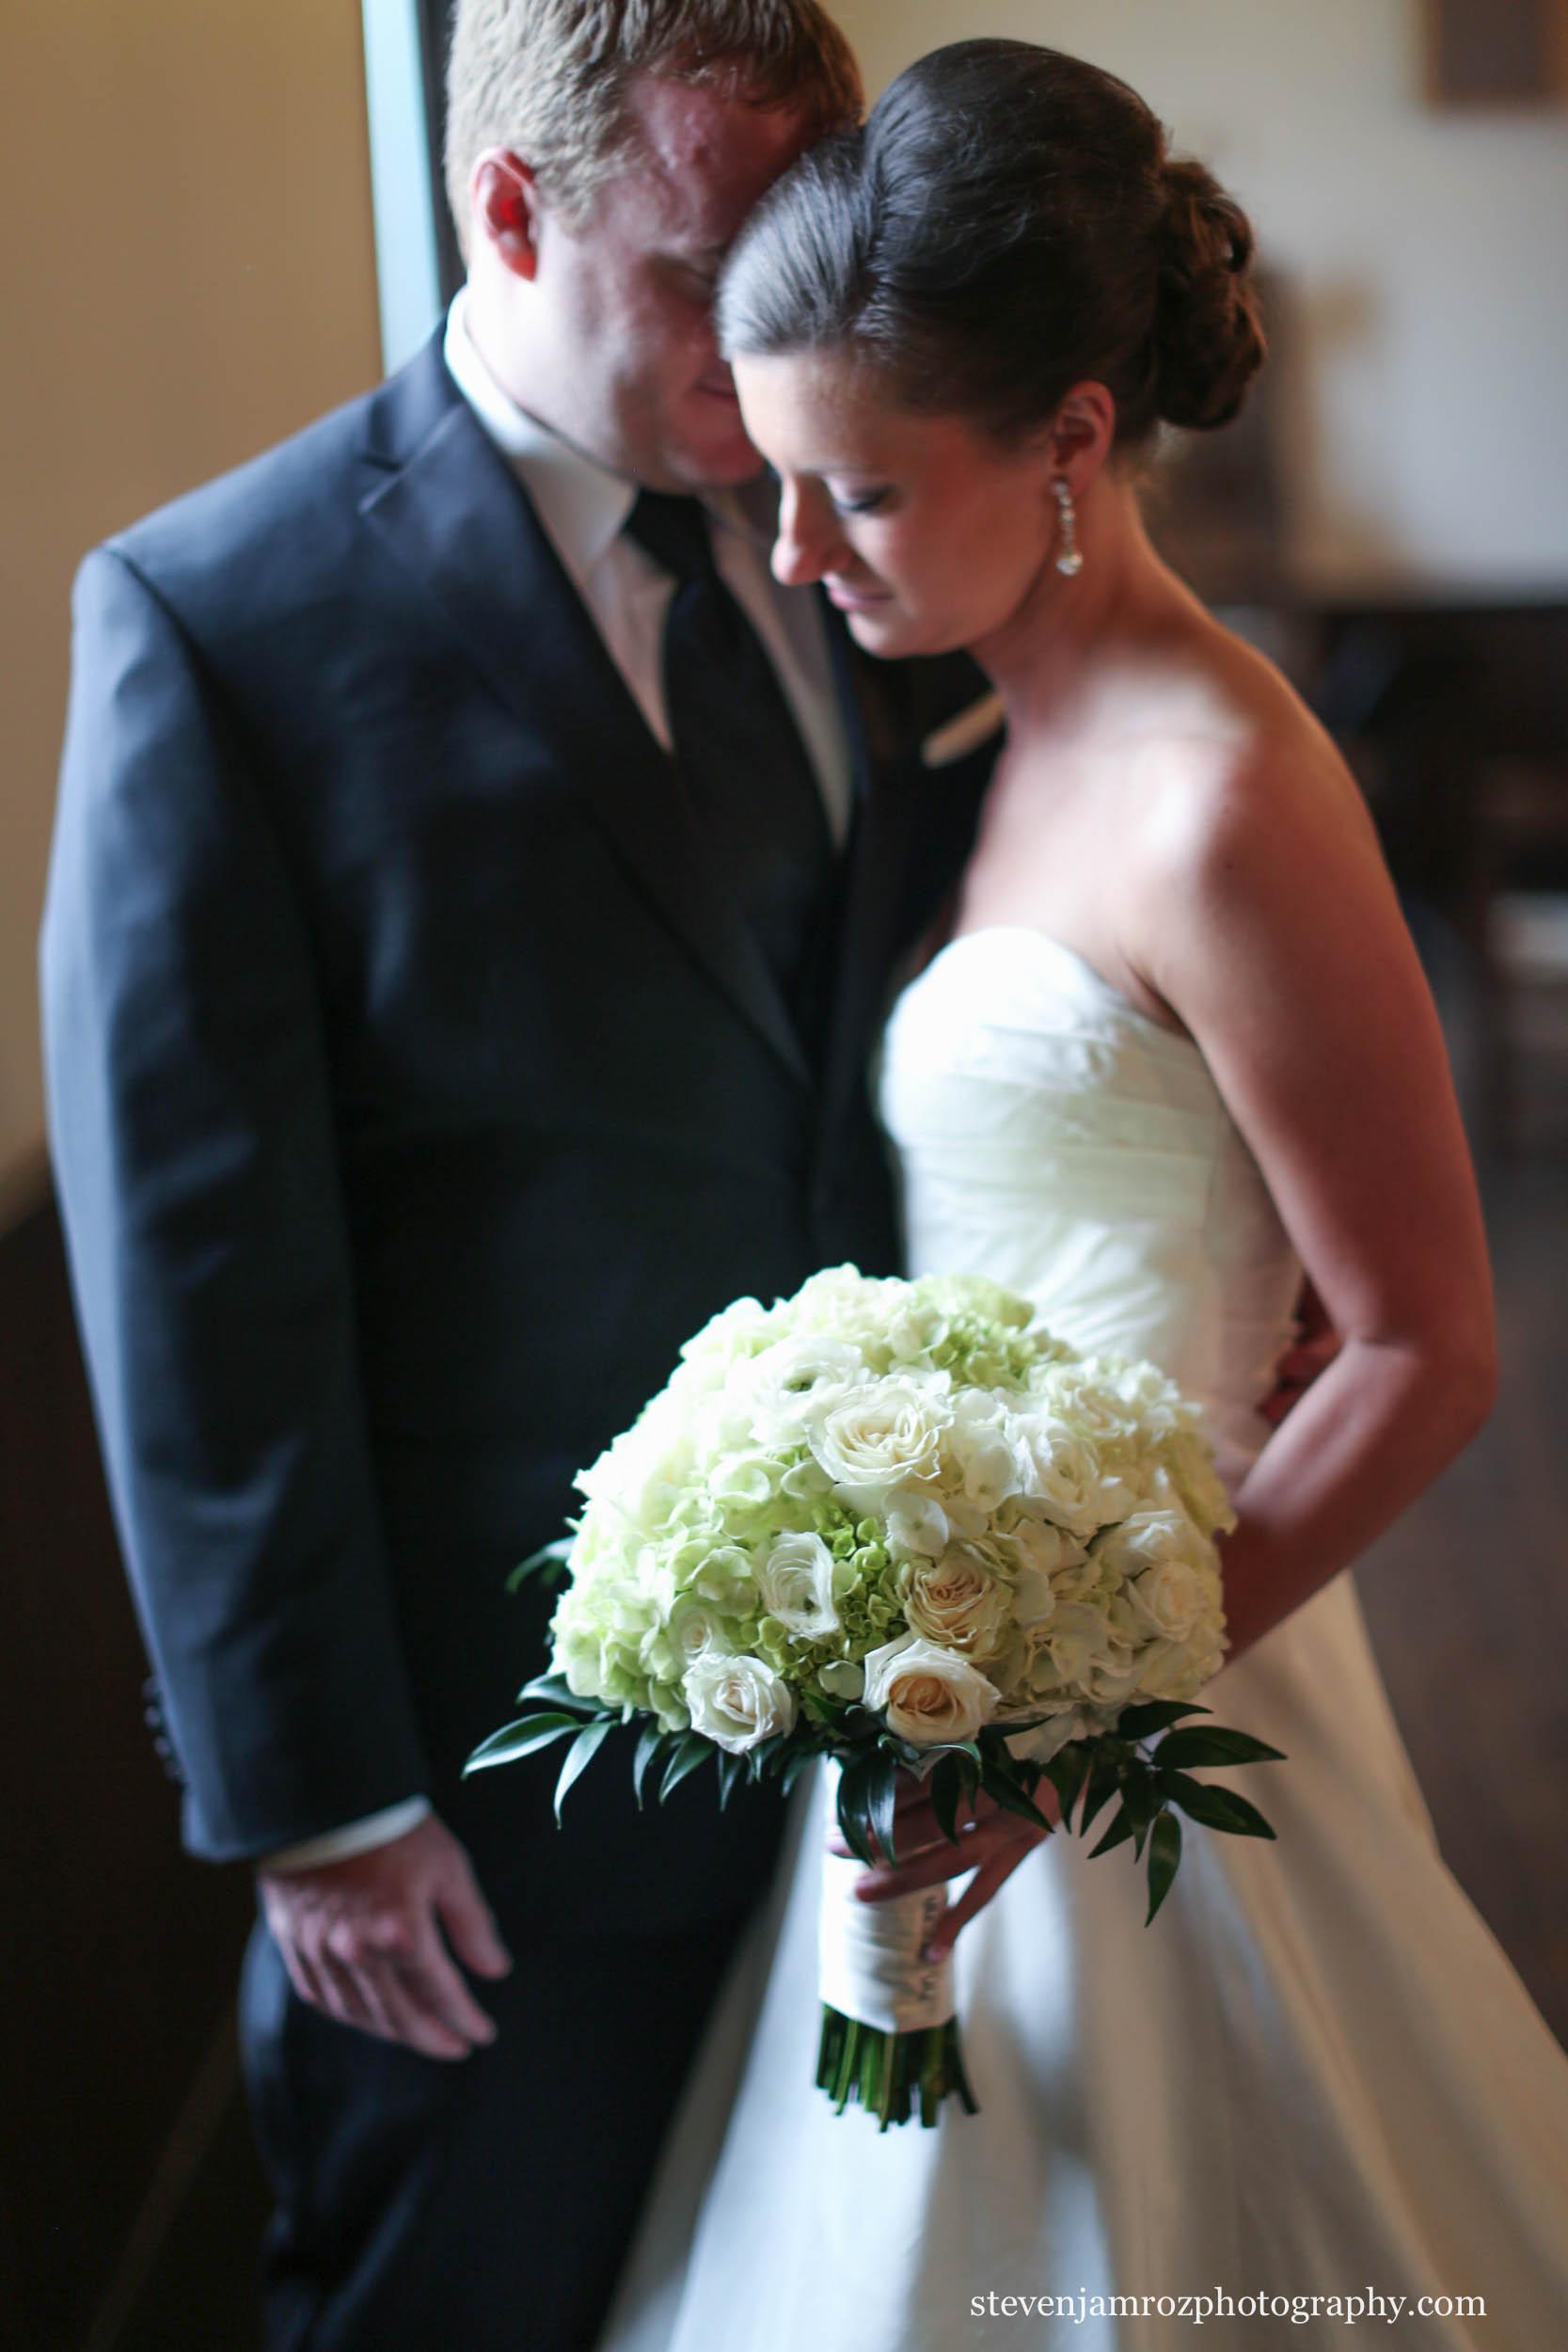 all-saints-church-raleigh-wedding photographer-steven-jamroz-0666.jpg